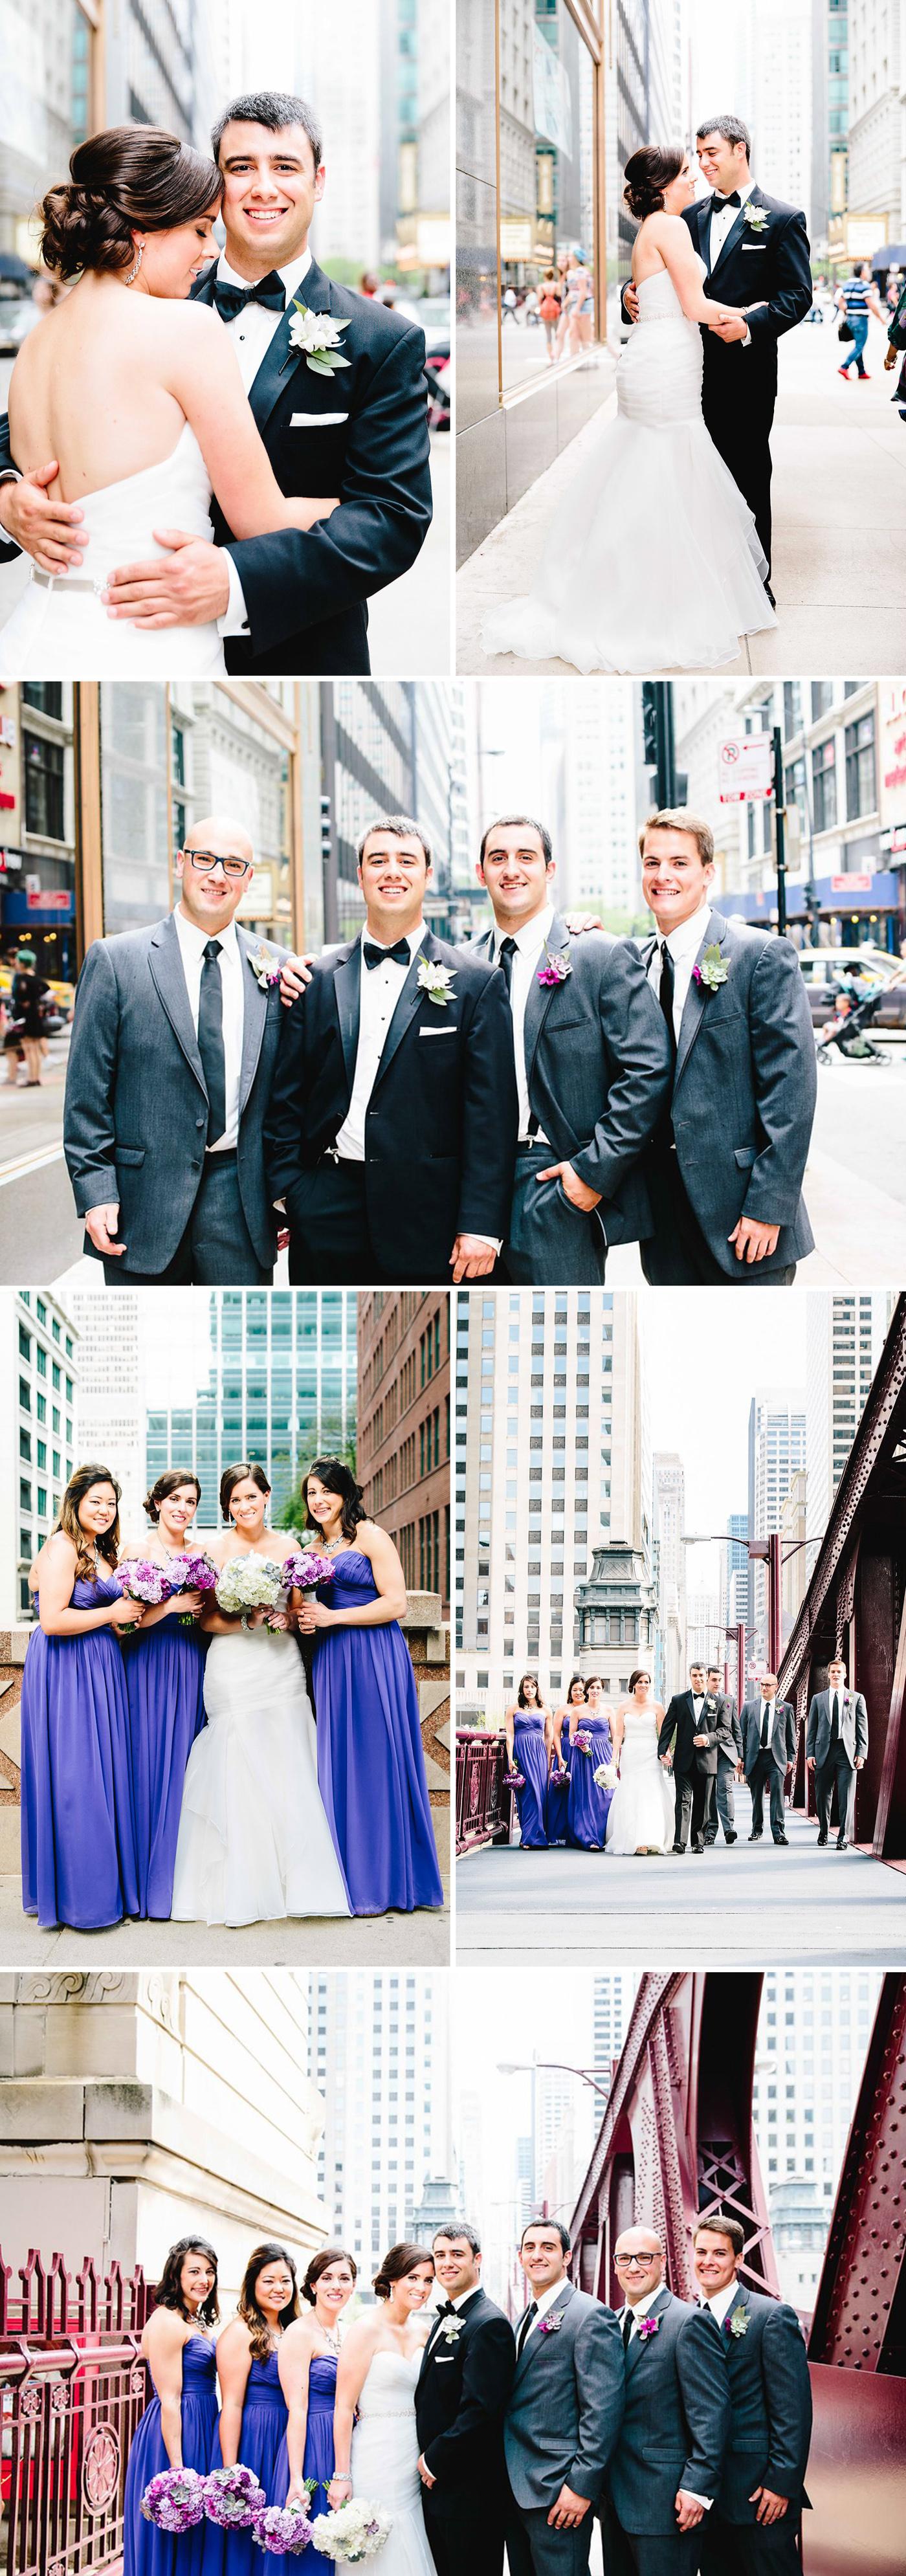 chicago-fine-art-wedding-photography-cassat5